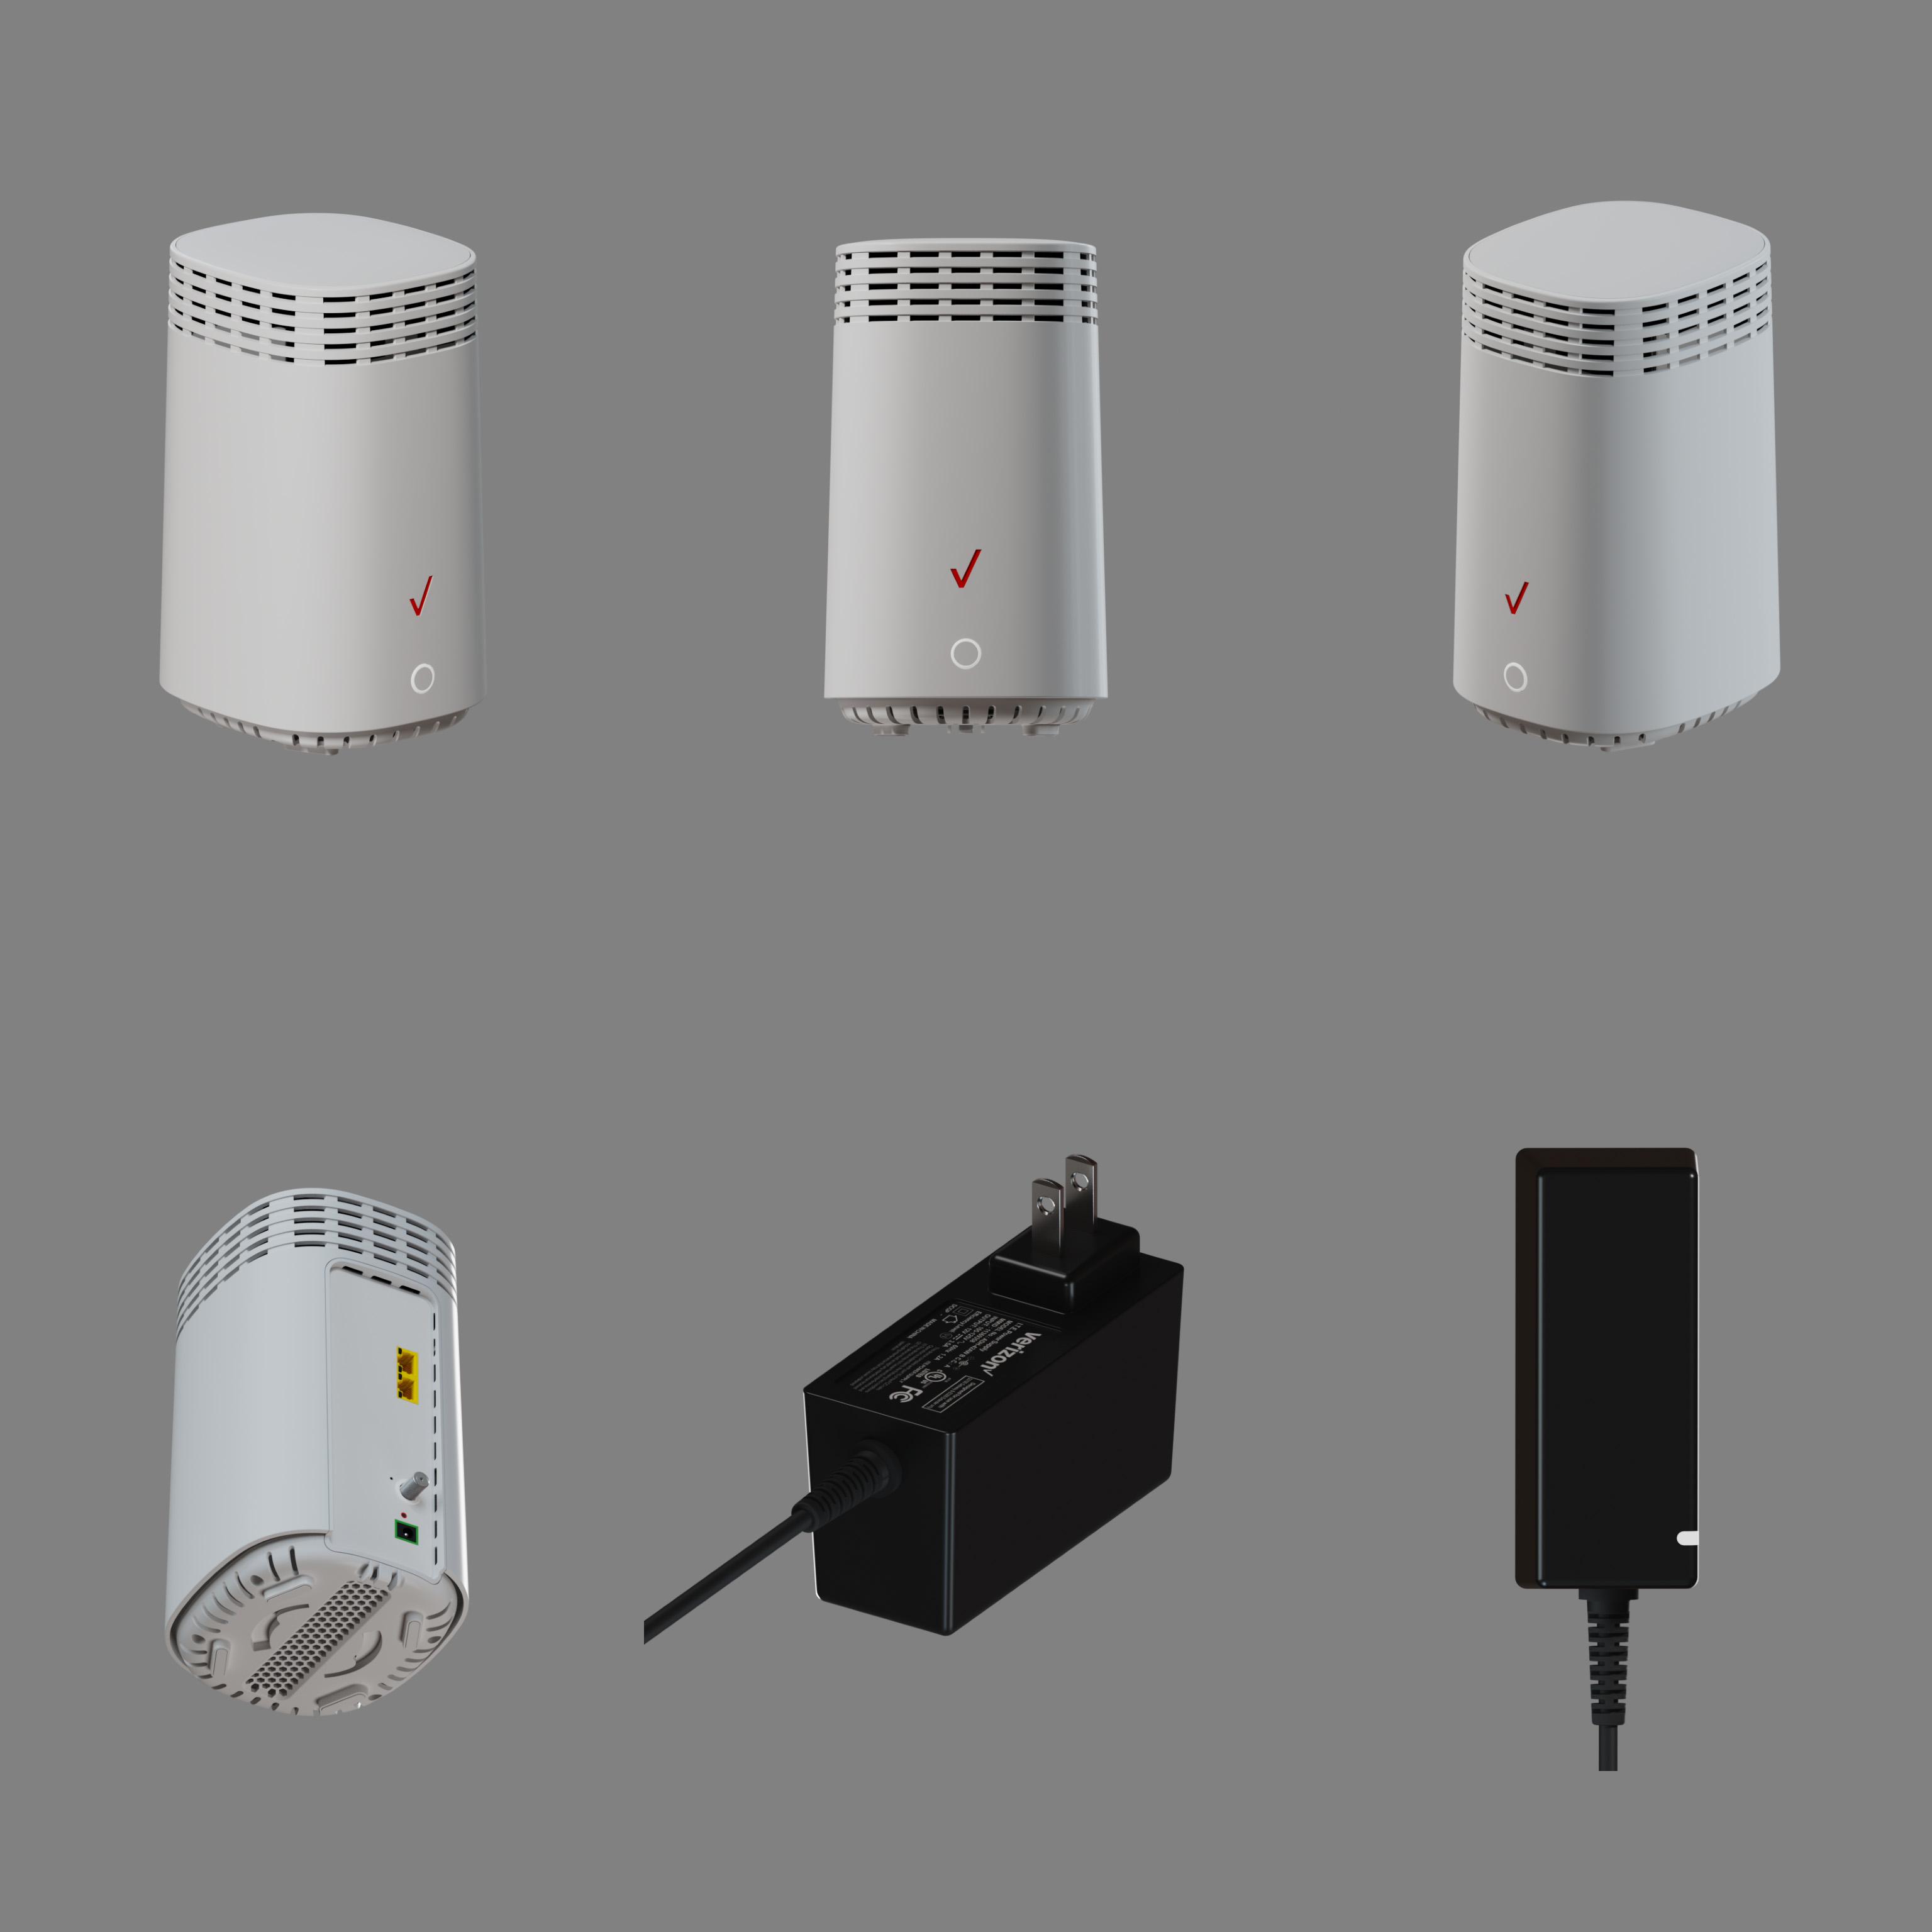 Verizon router v001